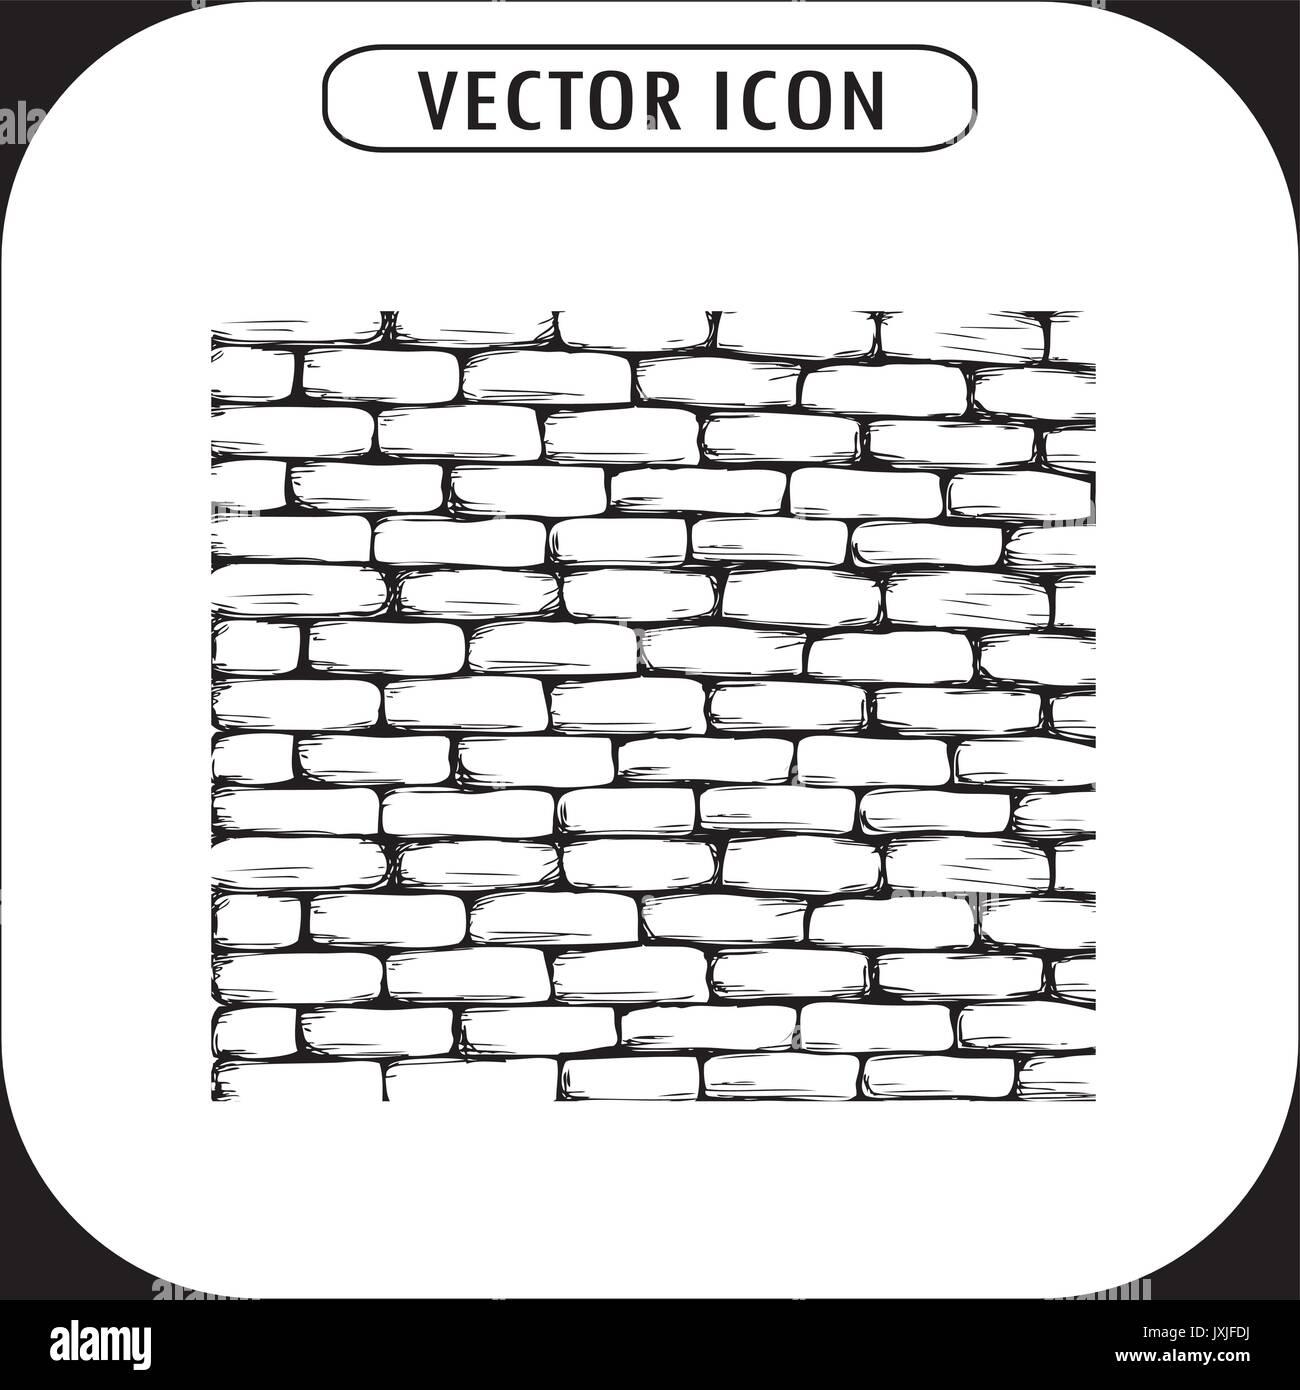 Mur De Brique L Icone Dessin A La Main Vector Image Vectorielle Stock Alamy